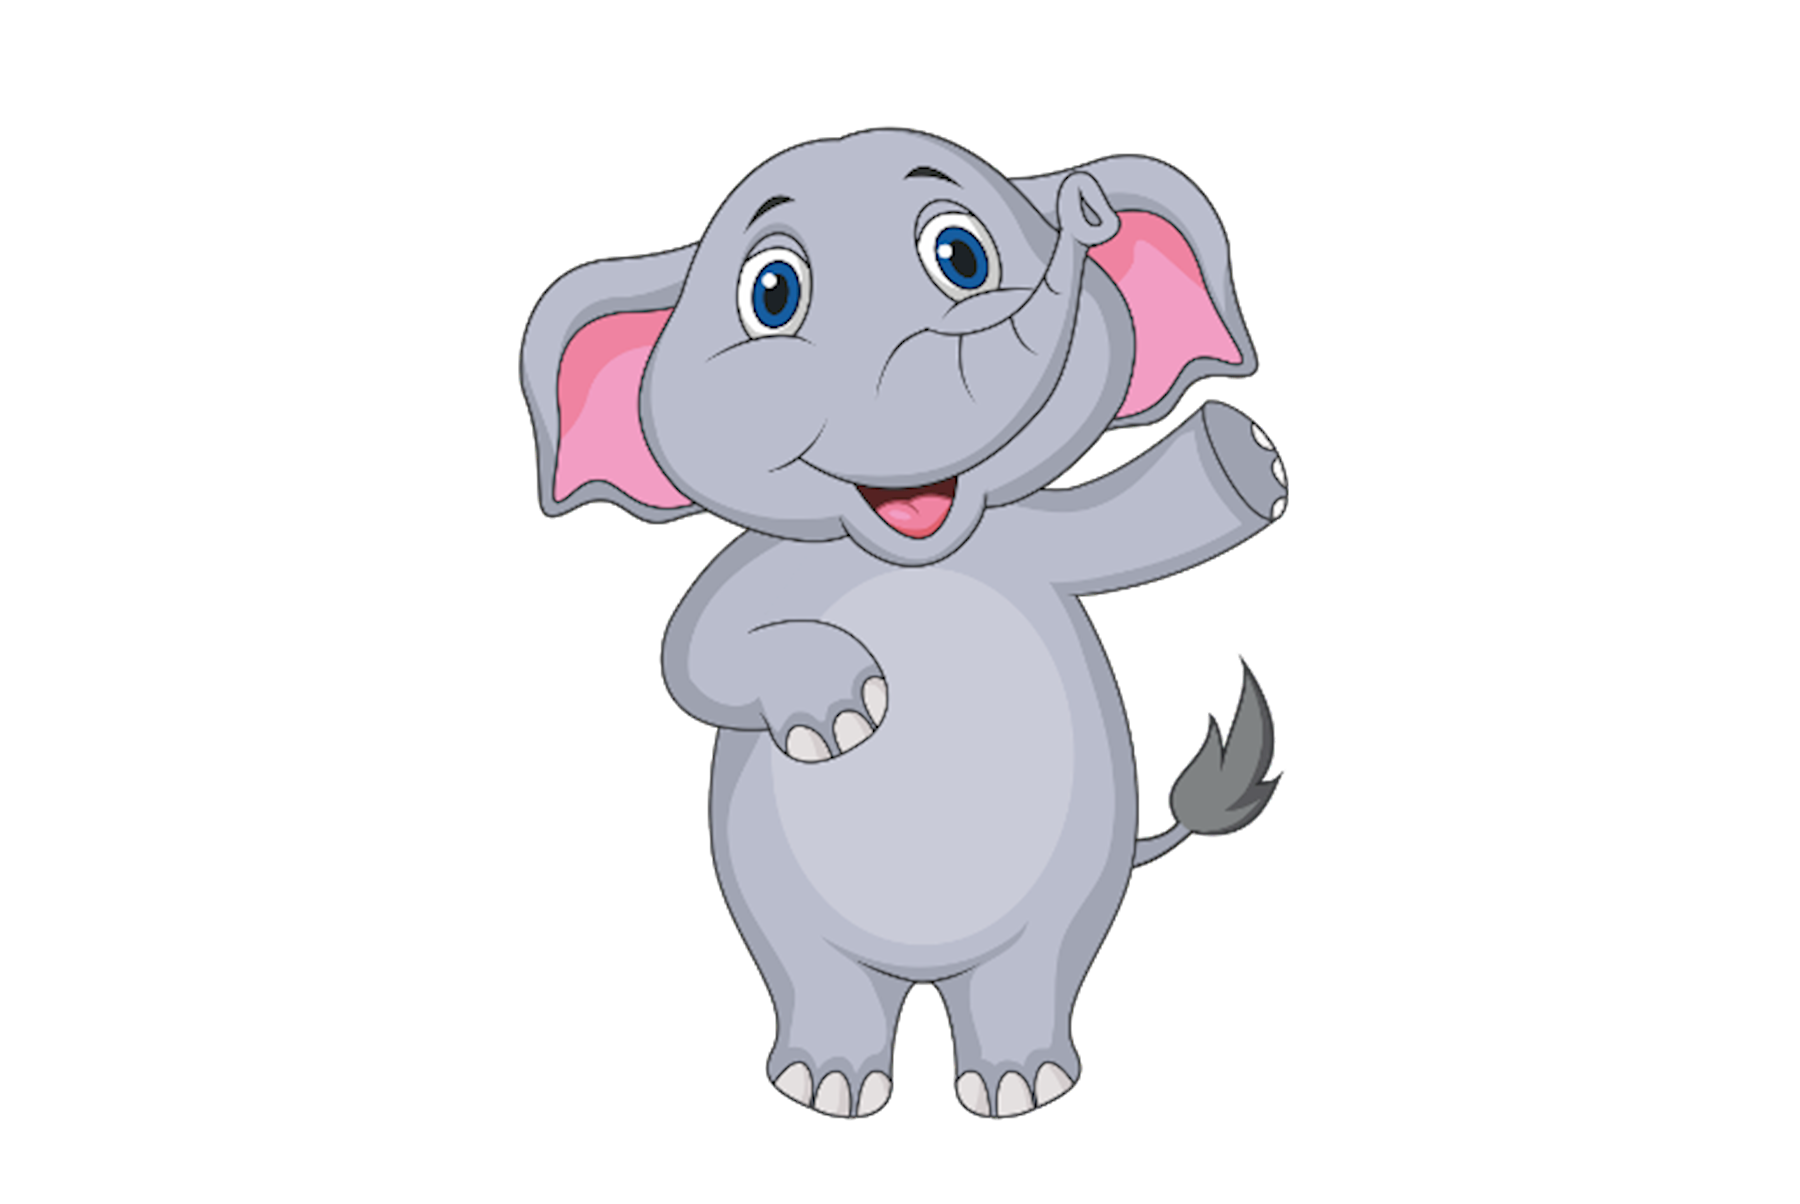 Elefanten wandtattoo s e xxl wandsticker mit elefanten ab 9 90 - Wandsticker elefant ...